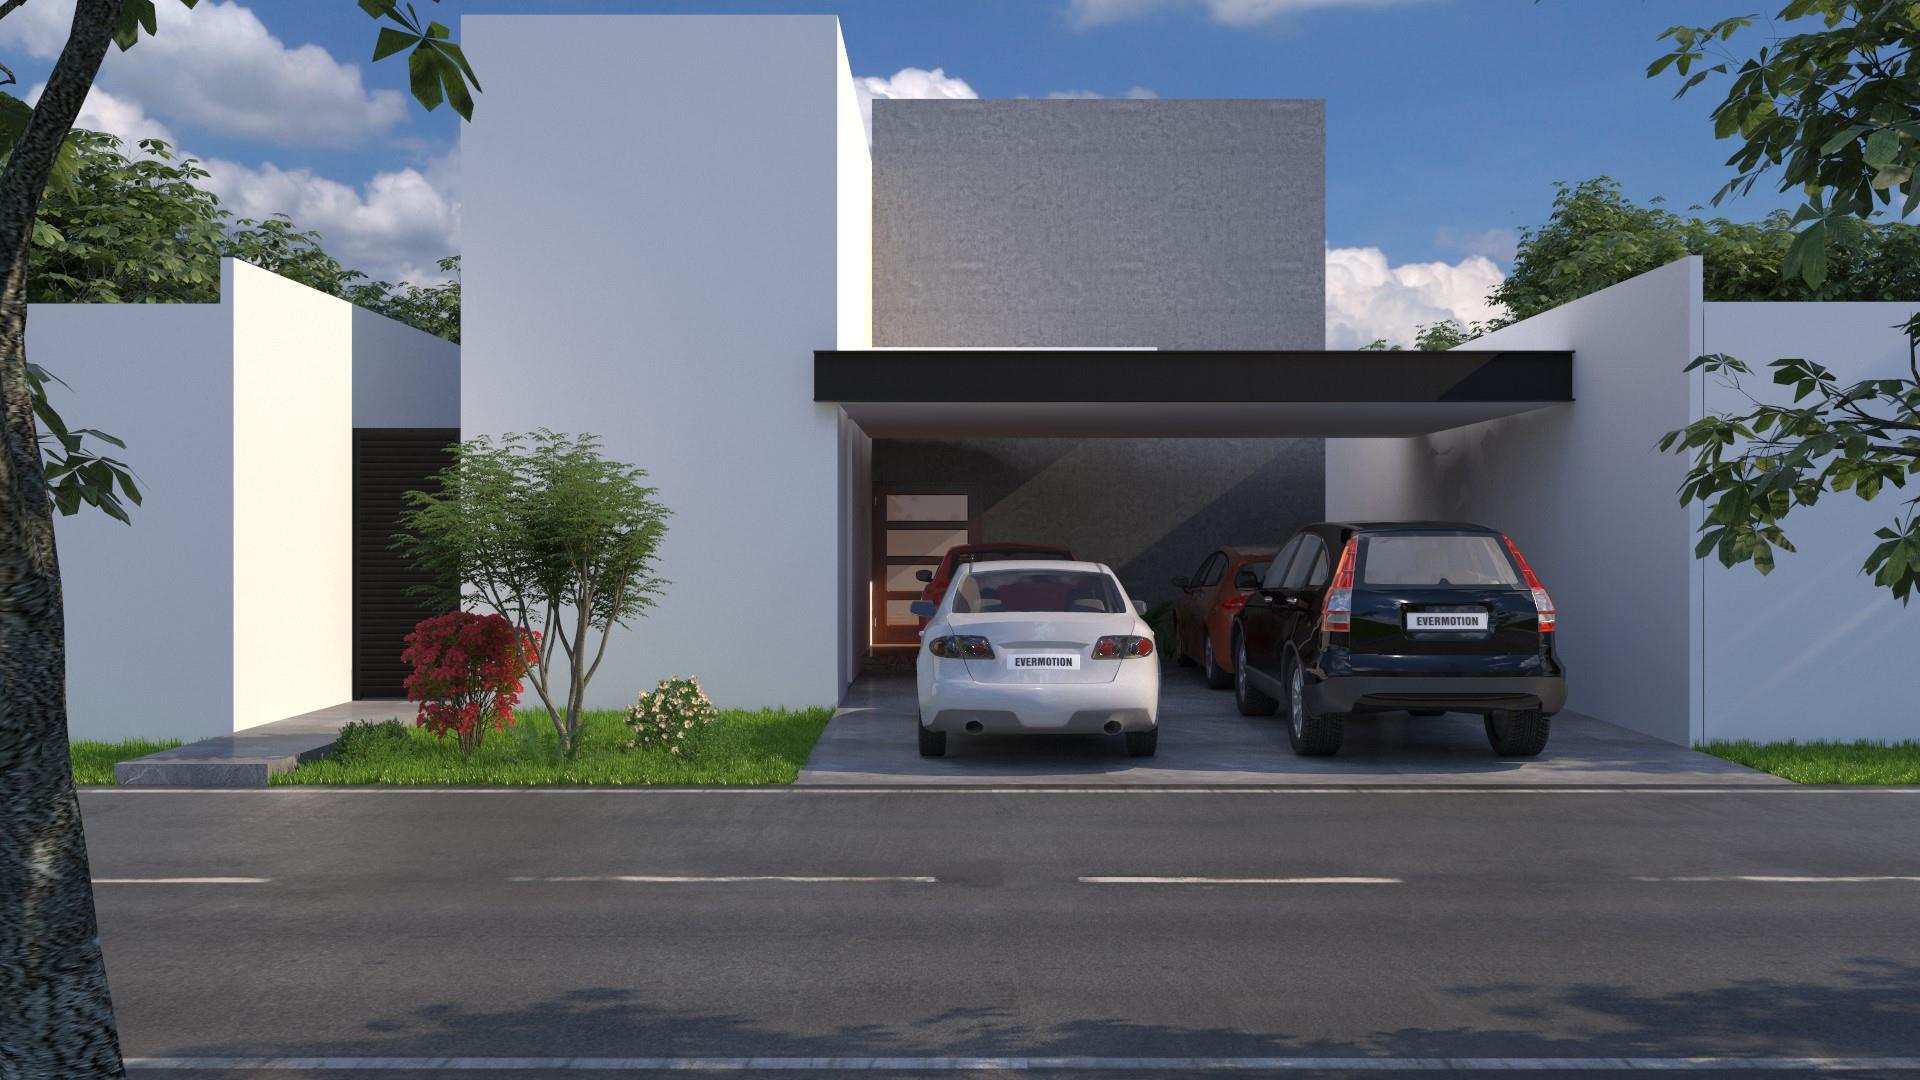 22 calle Property Photo - Merida Yucatan, real estate listing